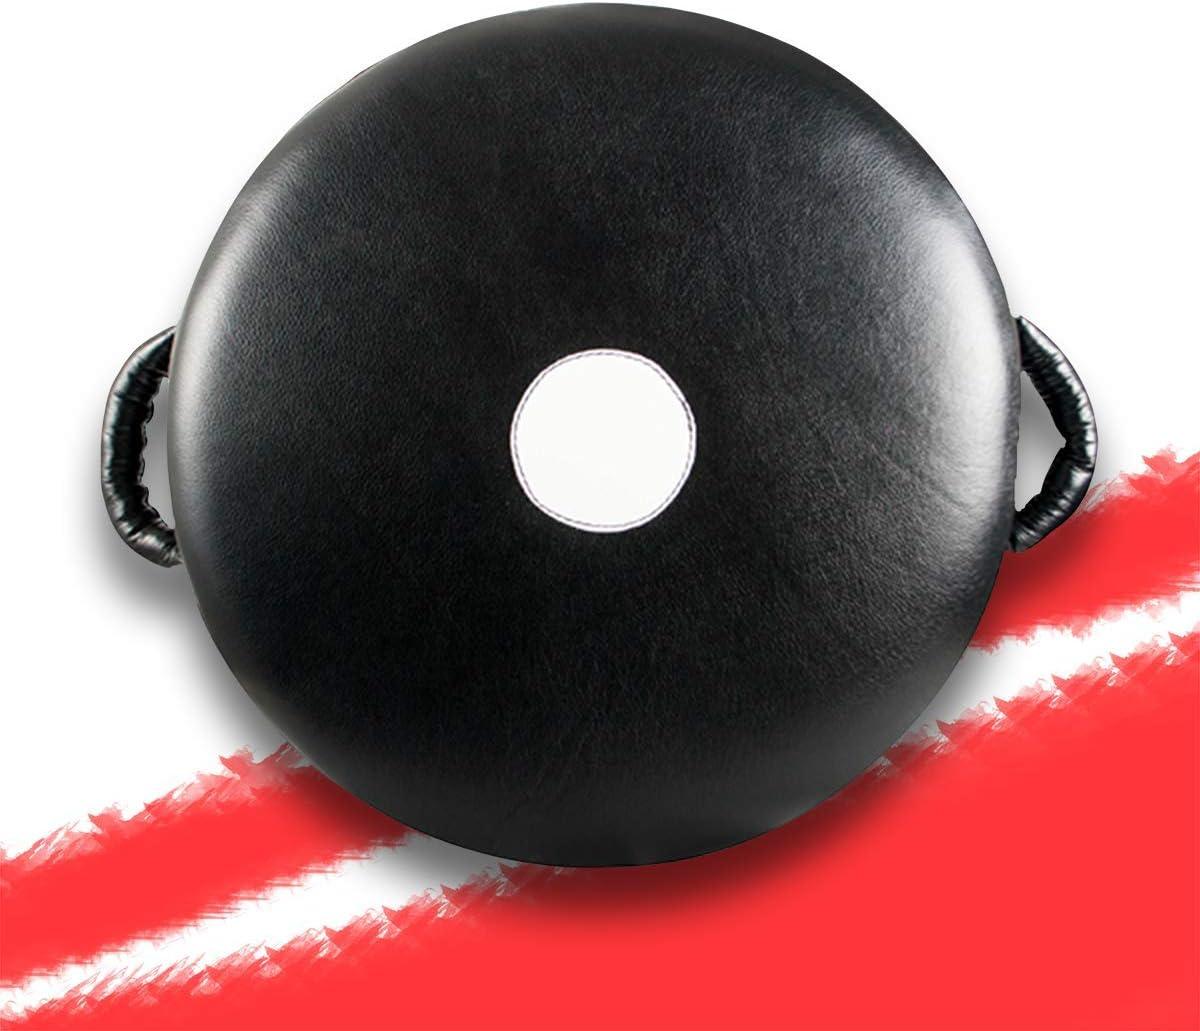 CLETO REYES Punch Round Cushion